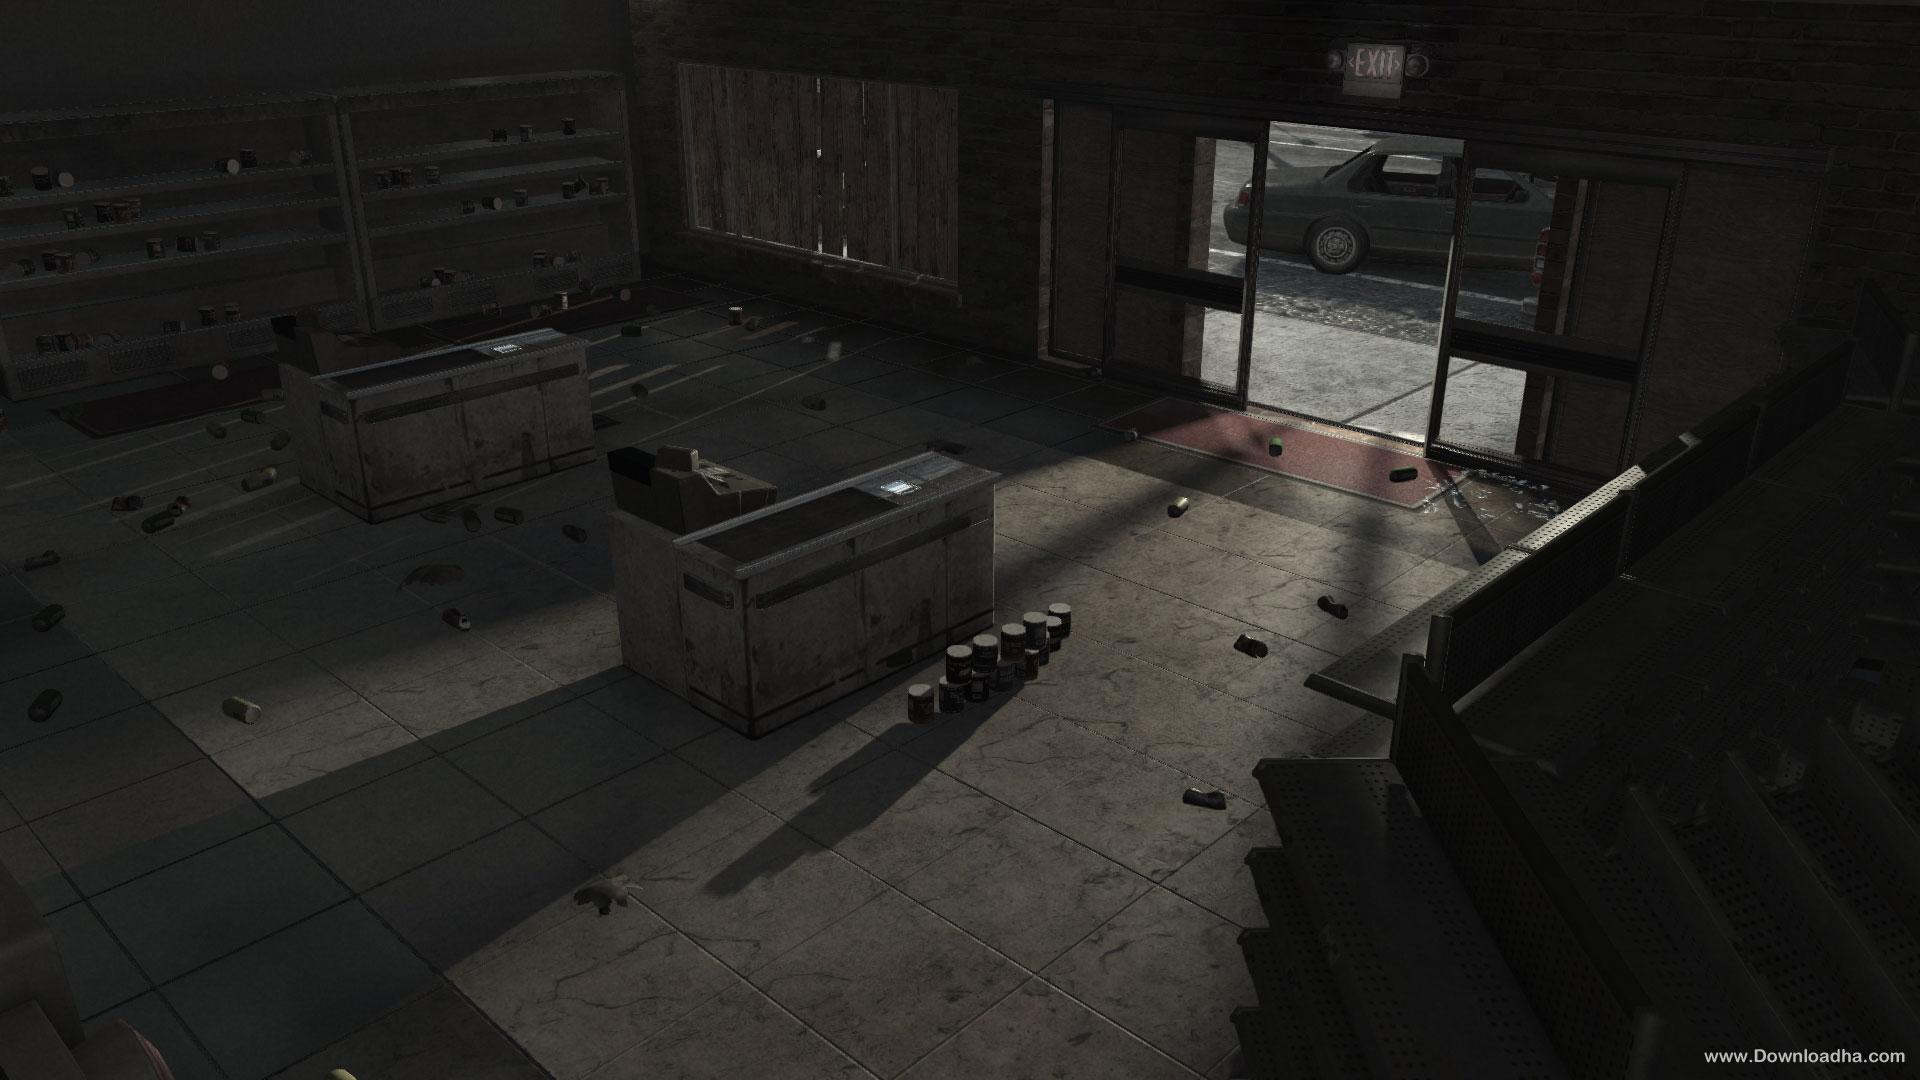 http://img3.downloadha.com/Hosein/Pic/Survival-Instinct-02-large.jpg